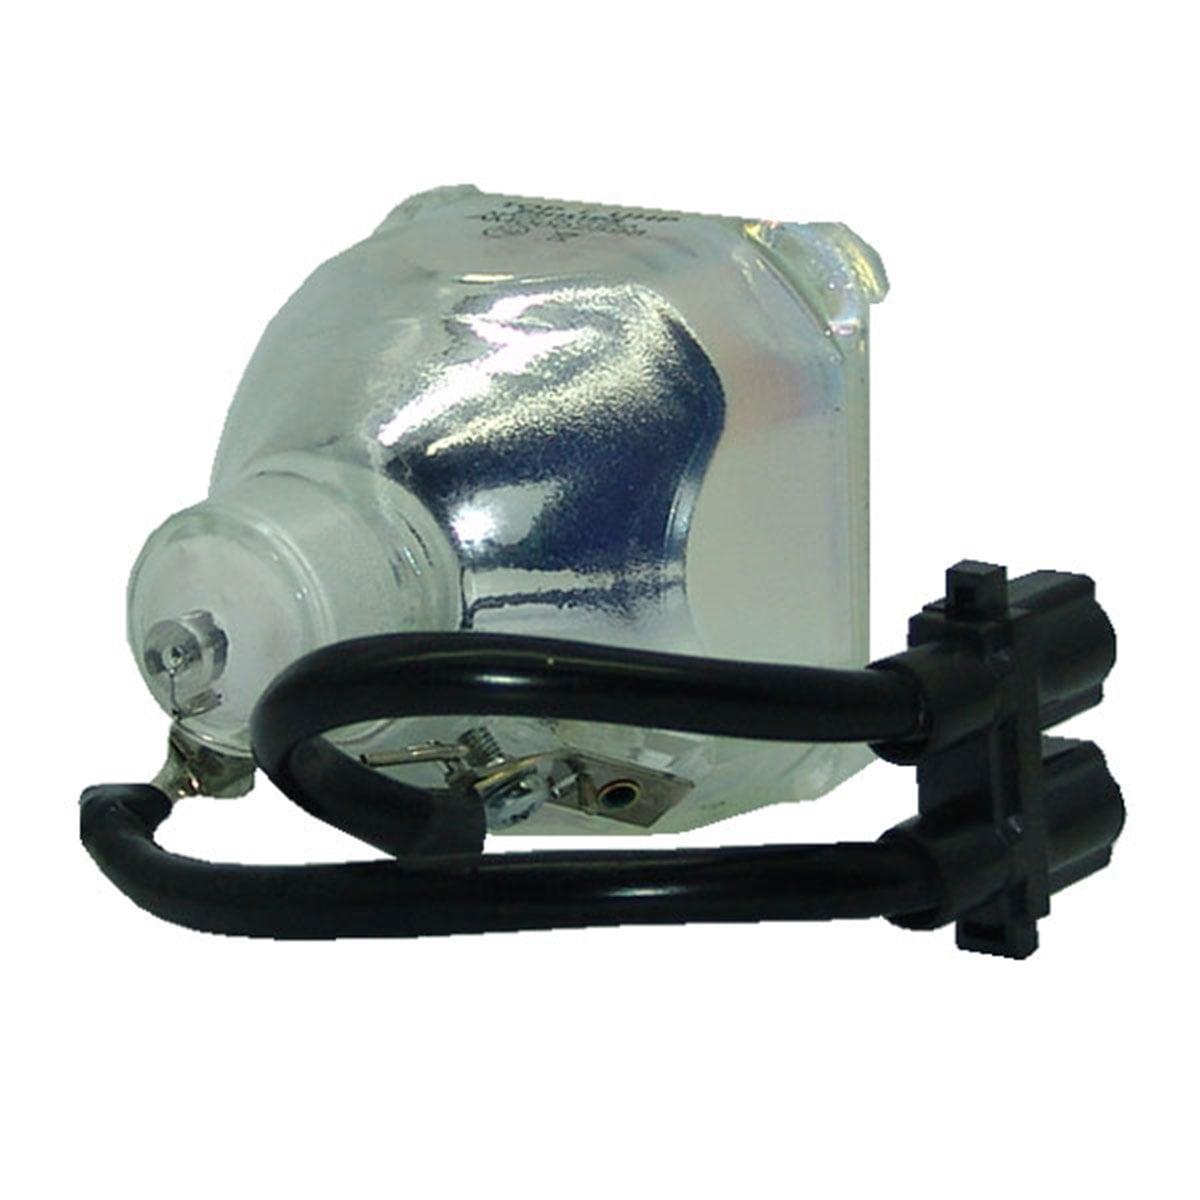 HD61G657 Philips Lamp//Bulb /& Housing for JVC TS-CL110UAA HD61FN97 HD61G587